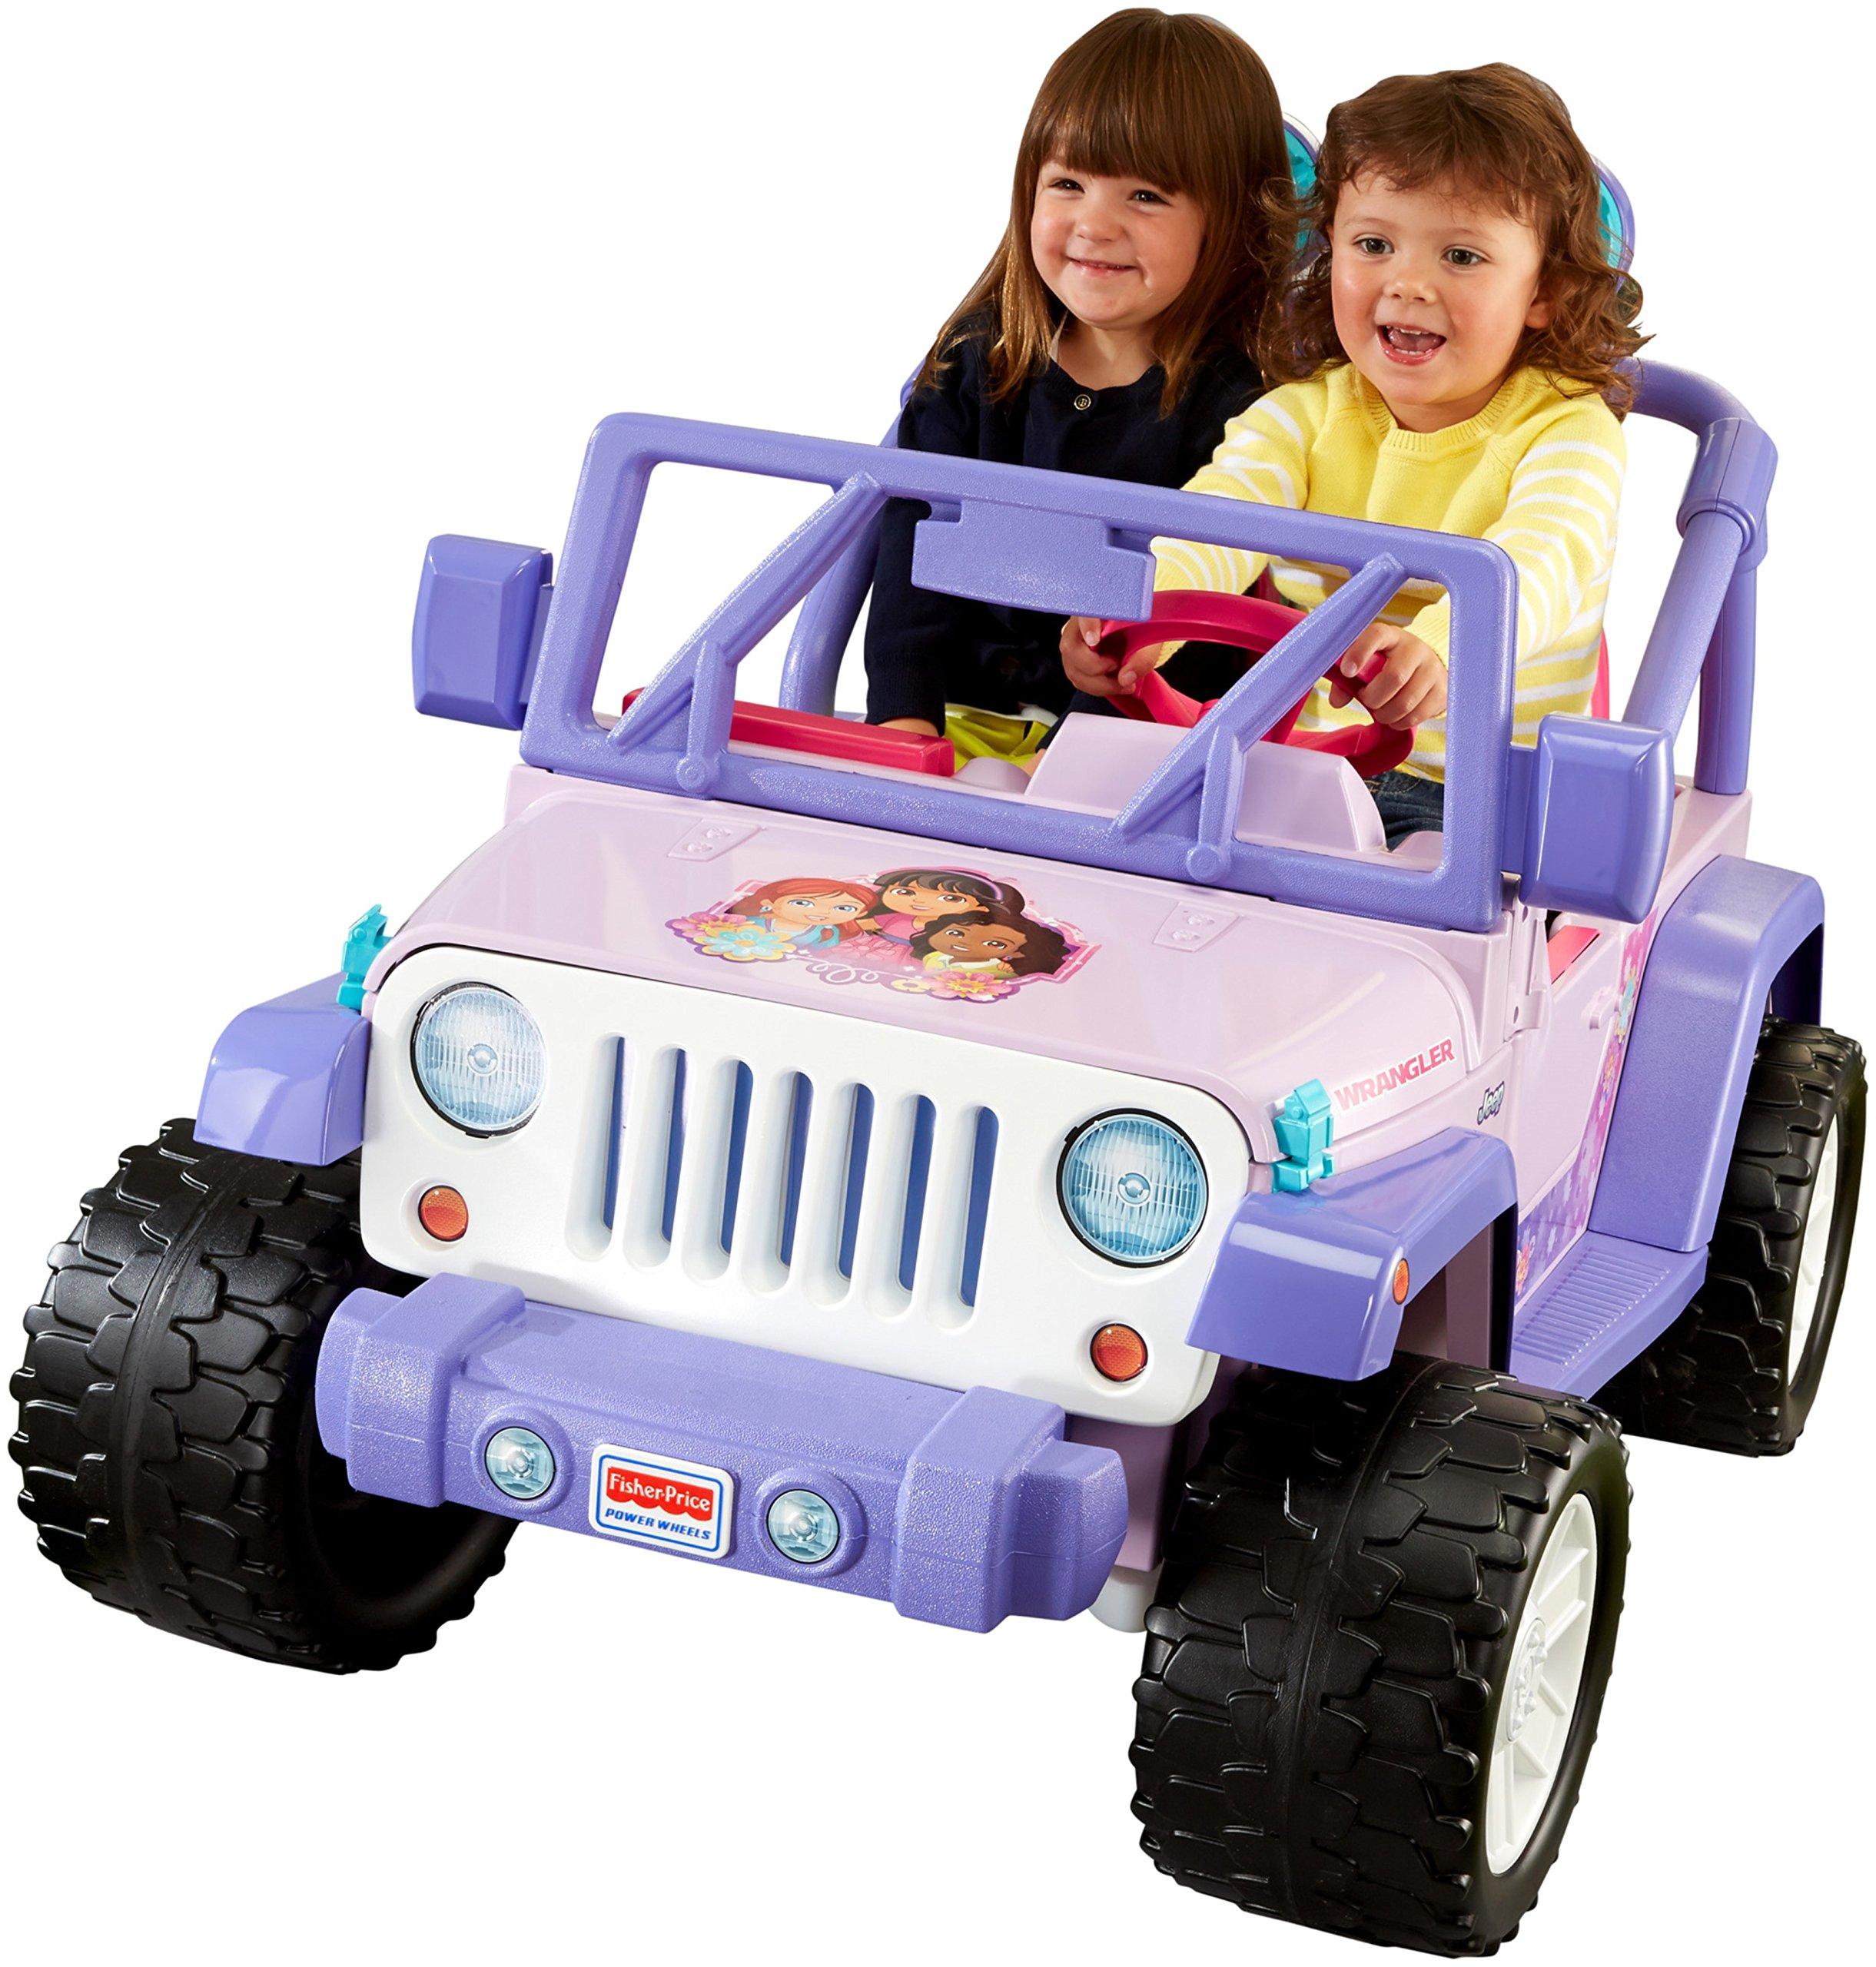 Power Wheels Fisher-Price Nickelodeon Dora & Friends Jeep Wrangler